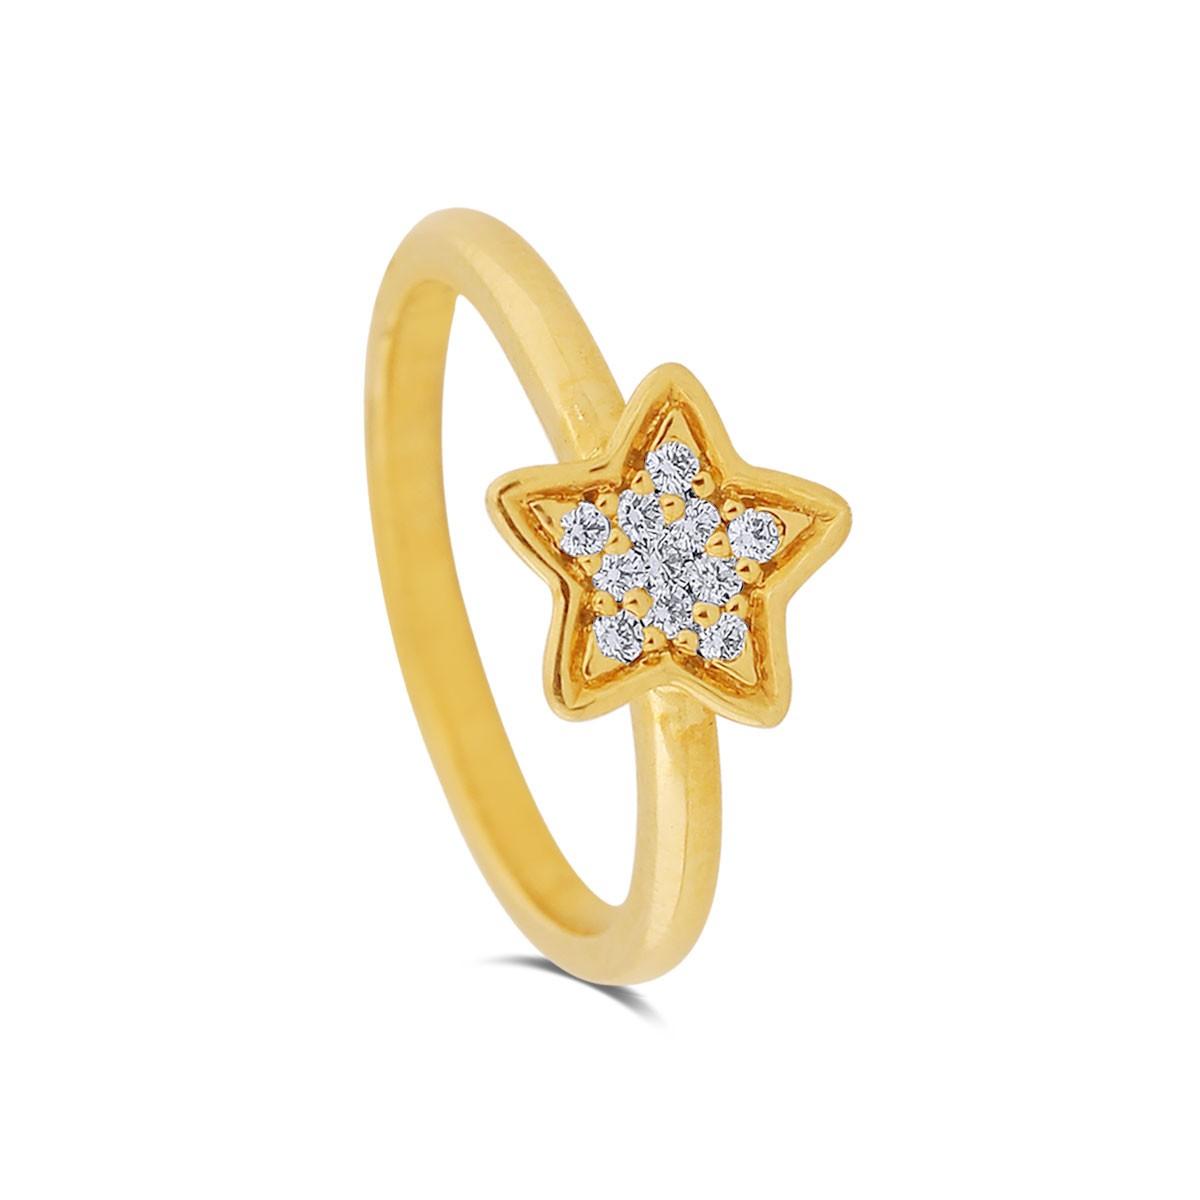 Estelle Yellow Gold Diamond Ring